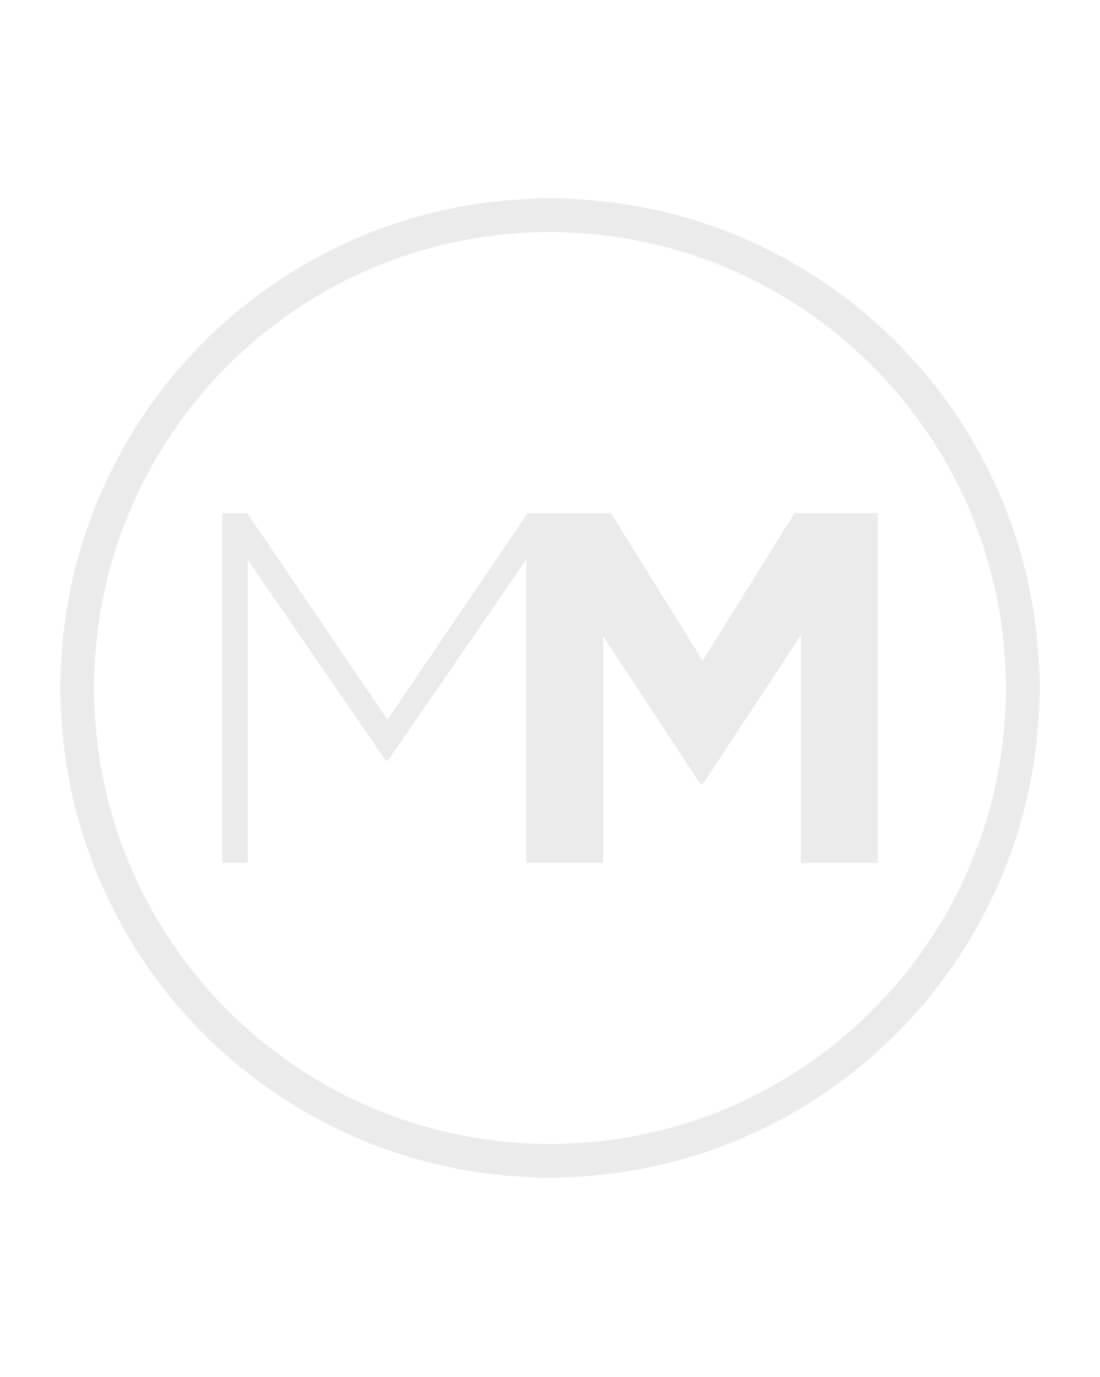 Expresso Margot Vest grijs